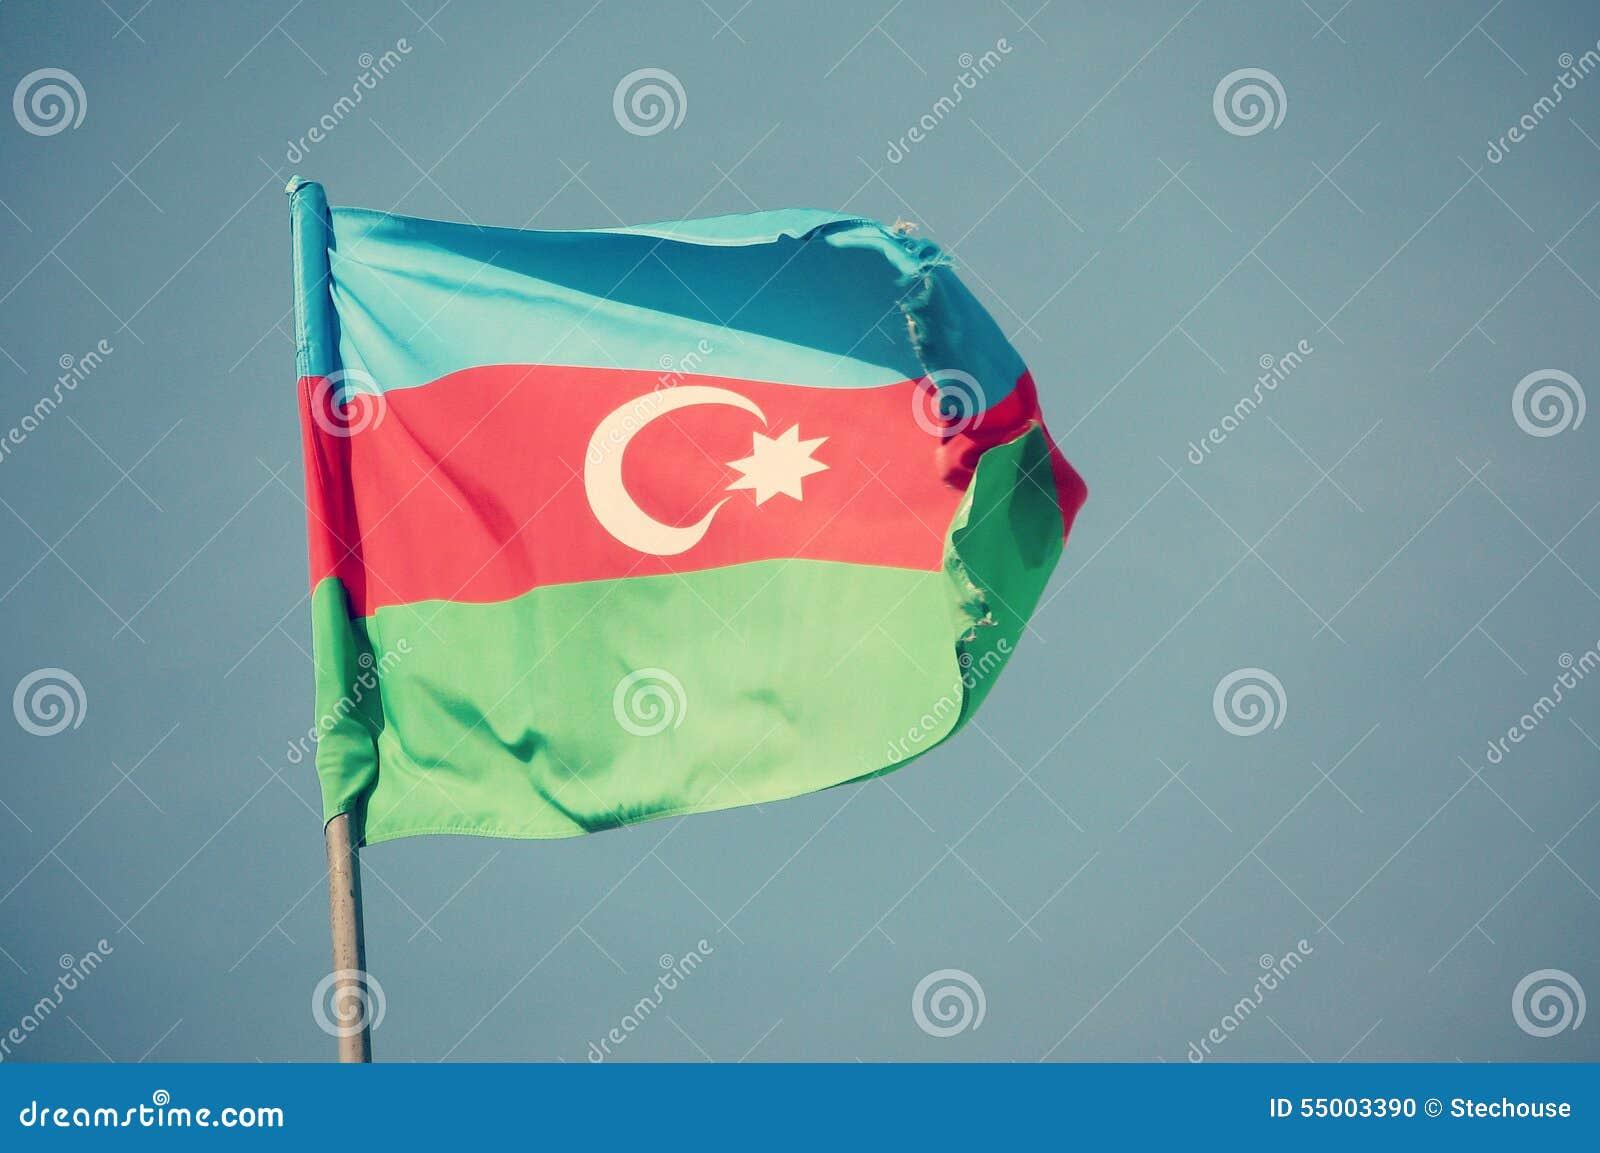 Azerbaijan Flag Filter